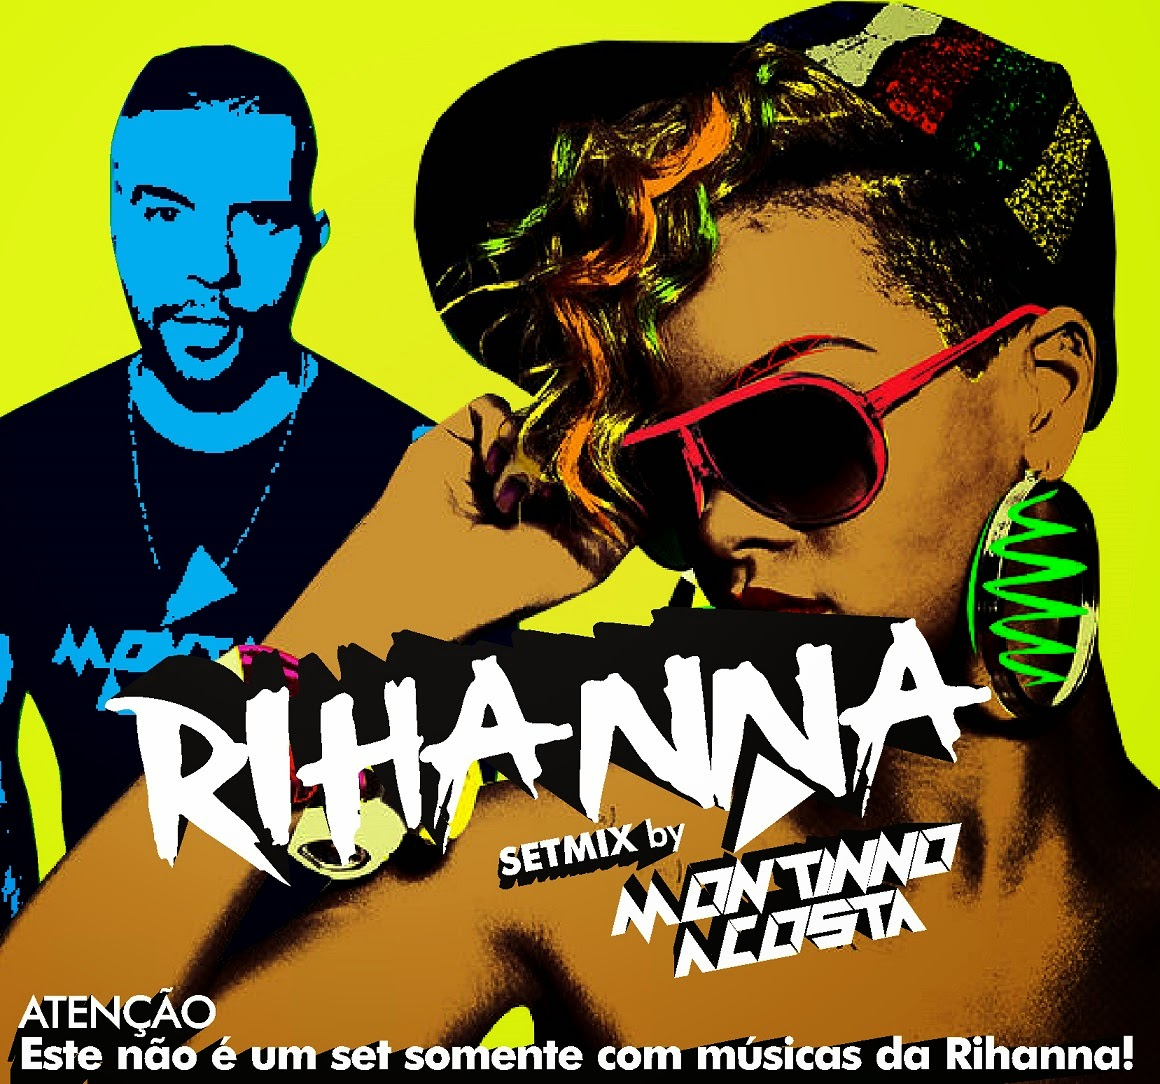 DJ Montinno Acosta - RIHANNA SETMIX